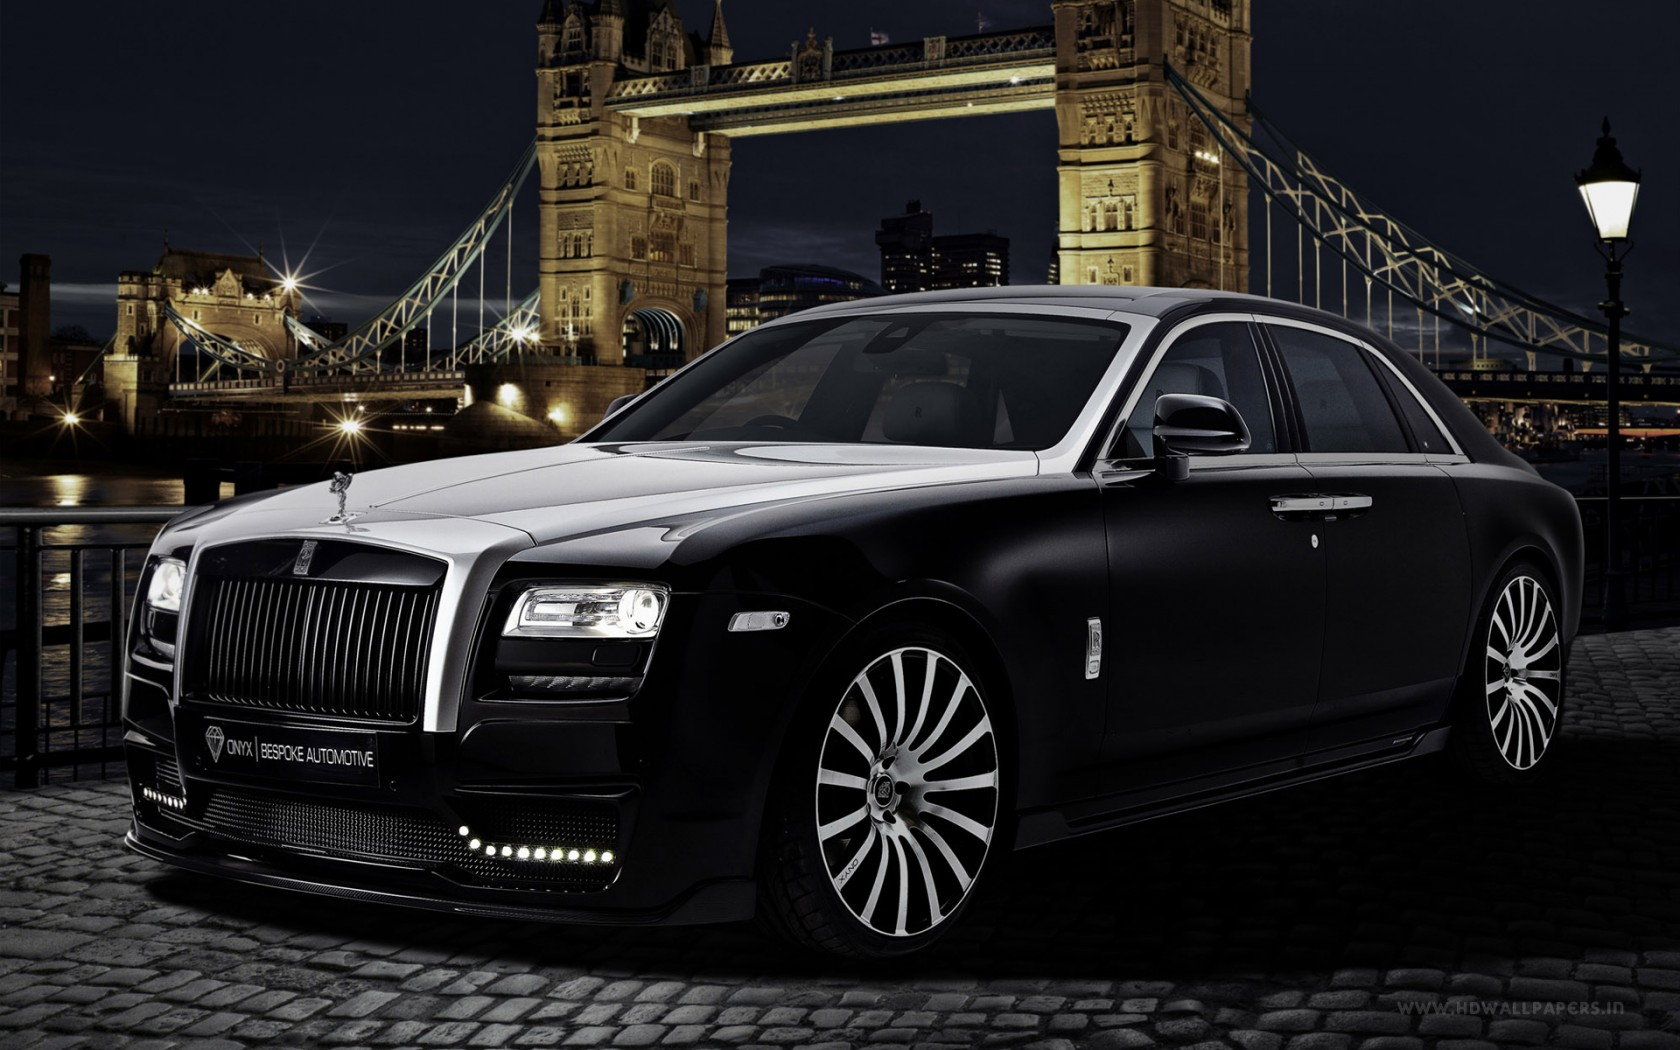 2015 Onyx Rolls Royce Ghost San Mortiz Wallpaper | HD Car ...